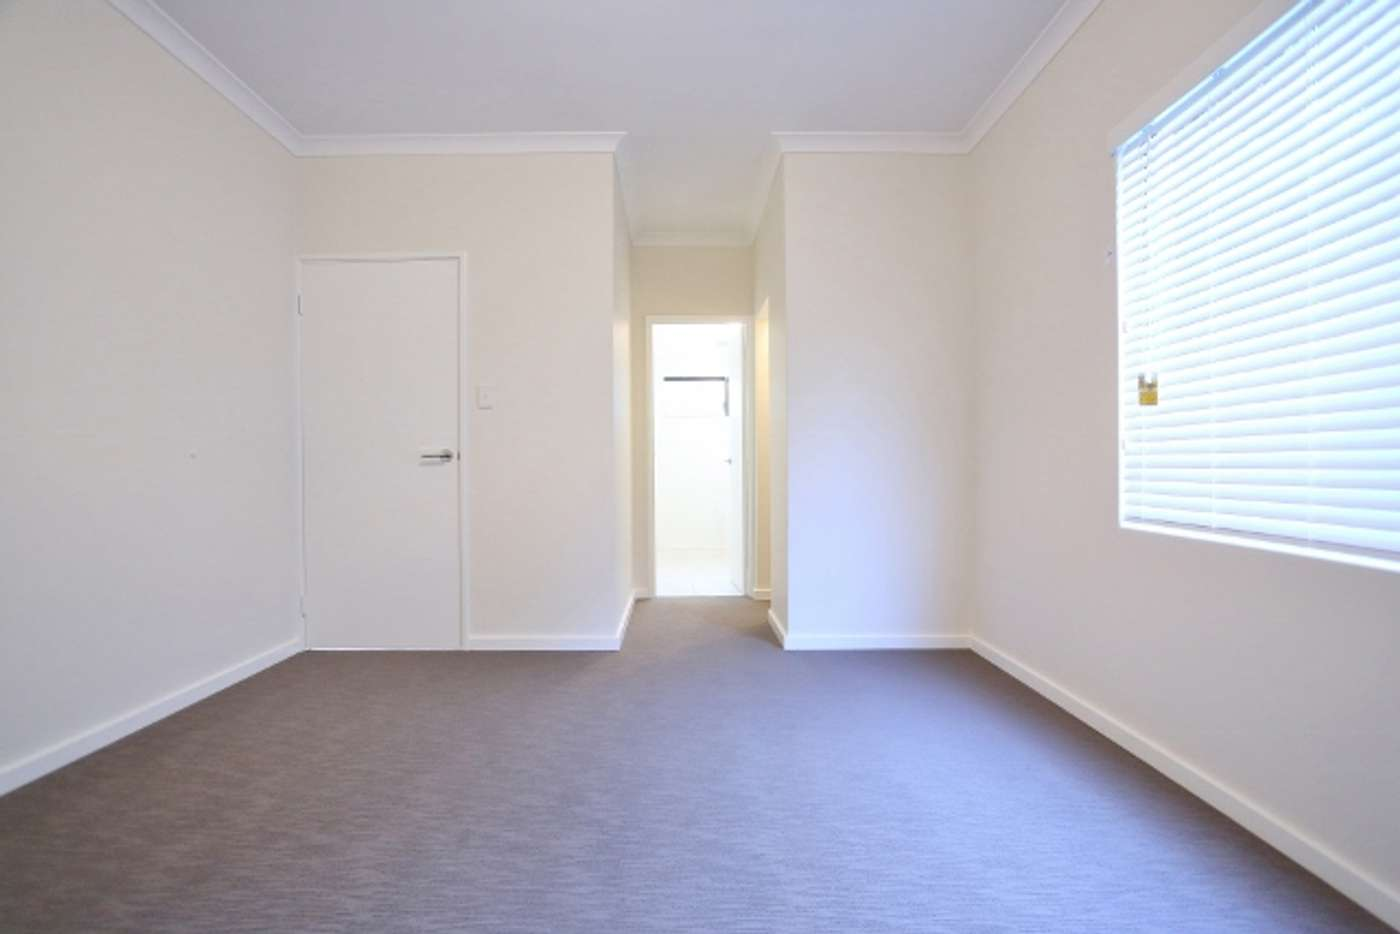 Seventh view of Homely house listing, 30C Muir Street, Innaloo WA 6018